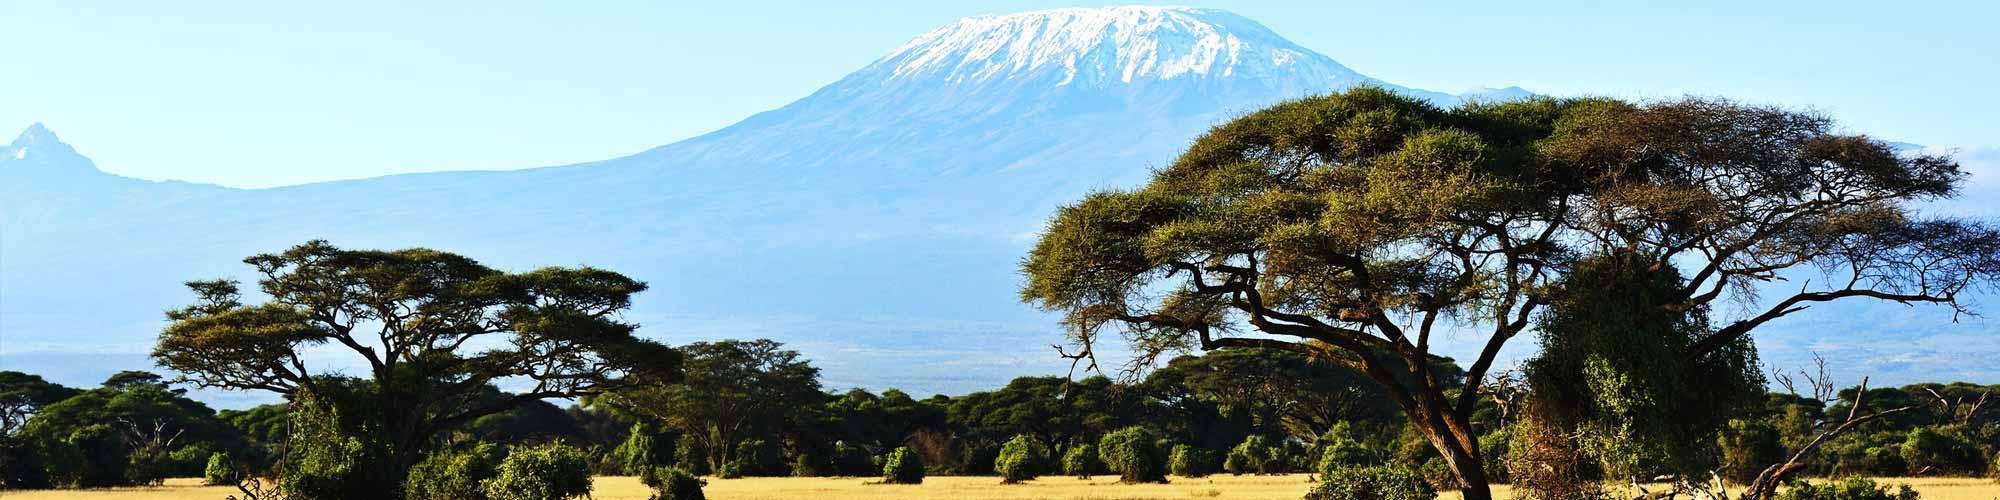 Tanzania - El Pais Viajes